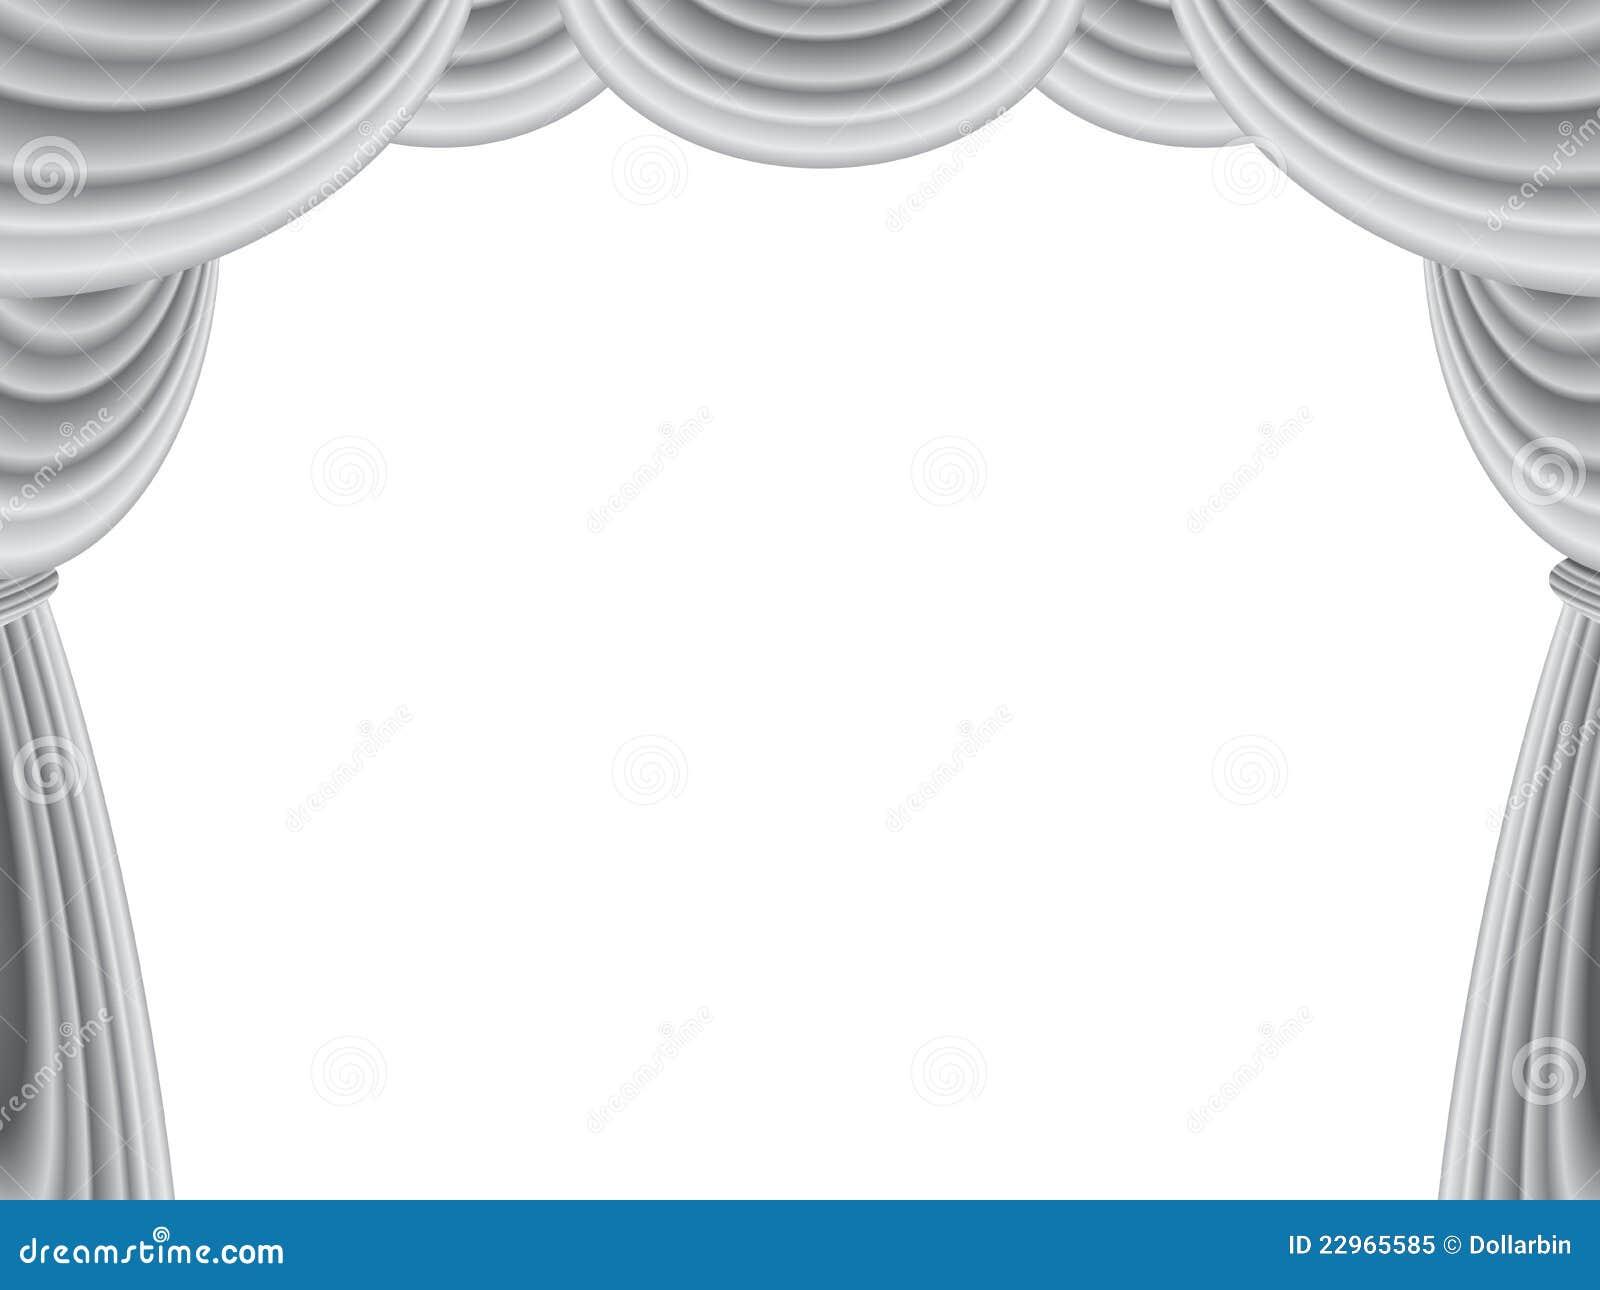 Black theatre curtain - Curtain Stage